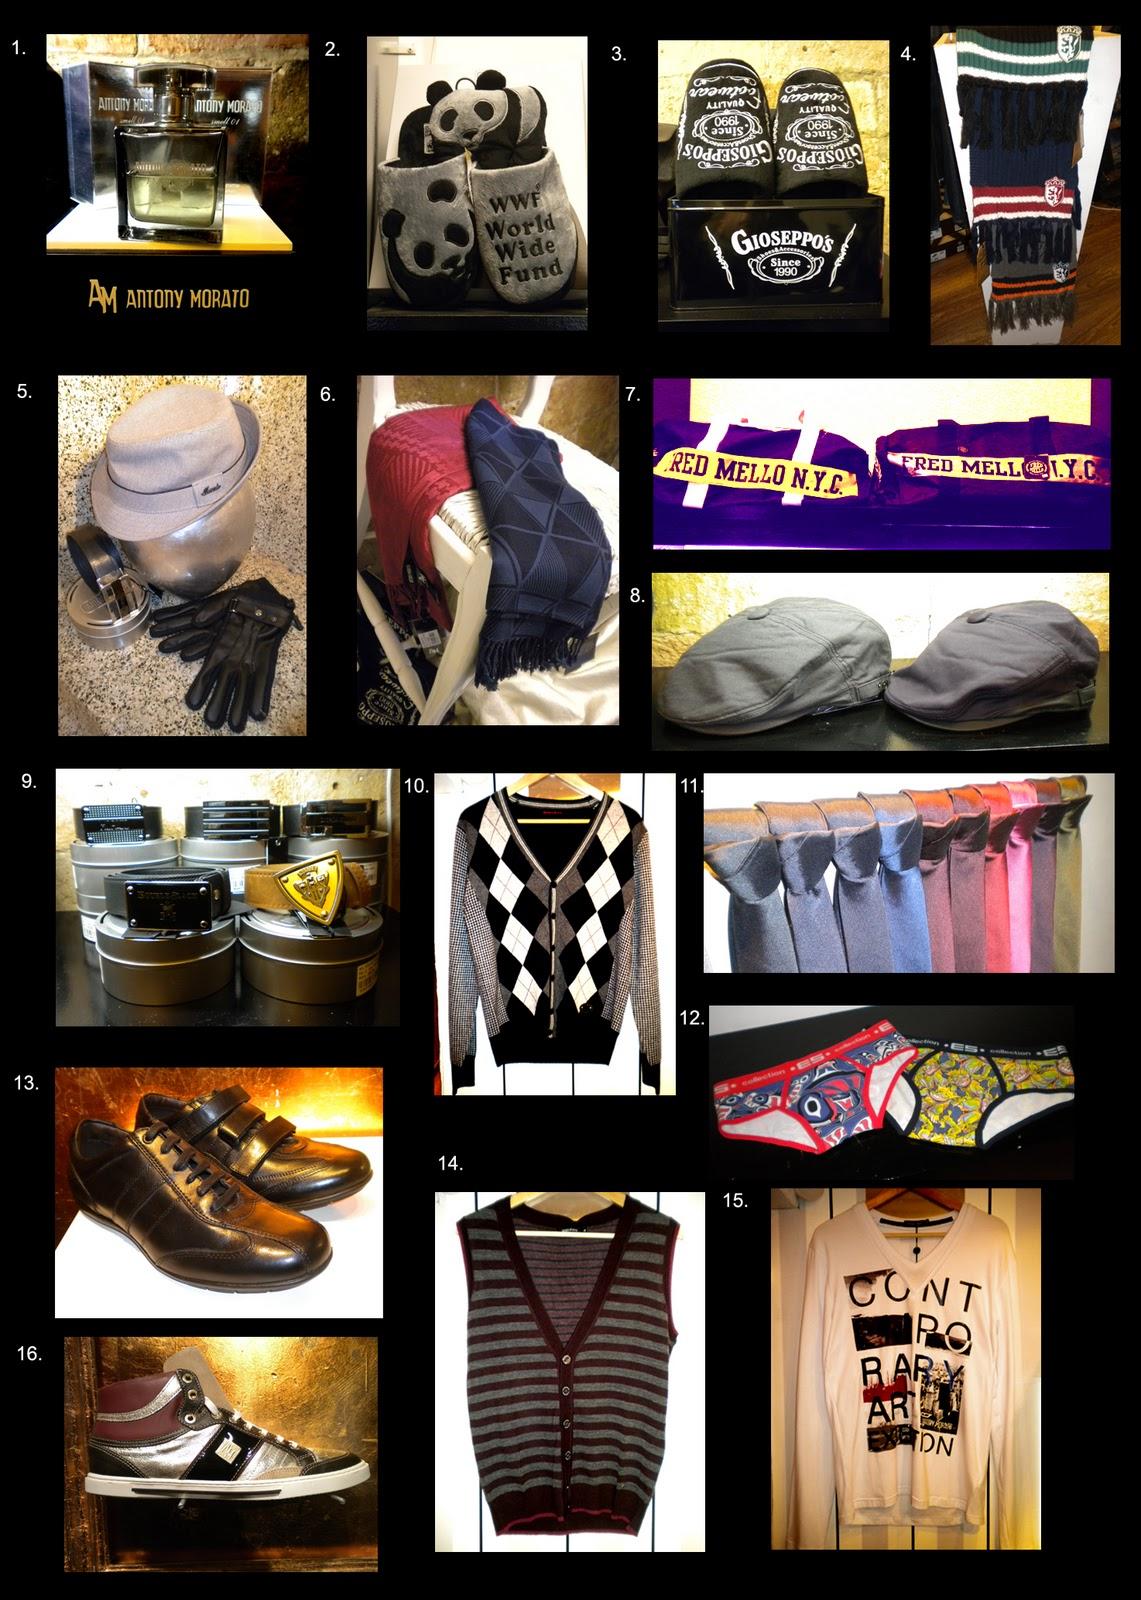 Bagoa fashion ideas regalo para navidad accesorios para hombre - Regalos para hombres en navidad ...